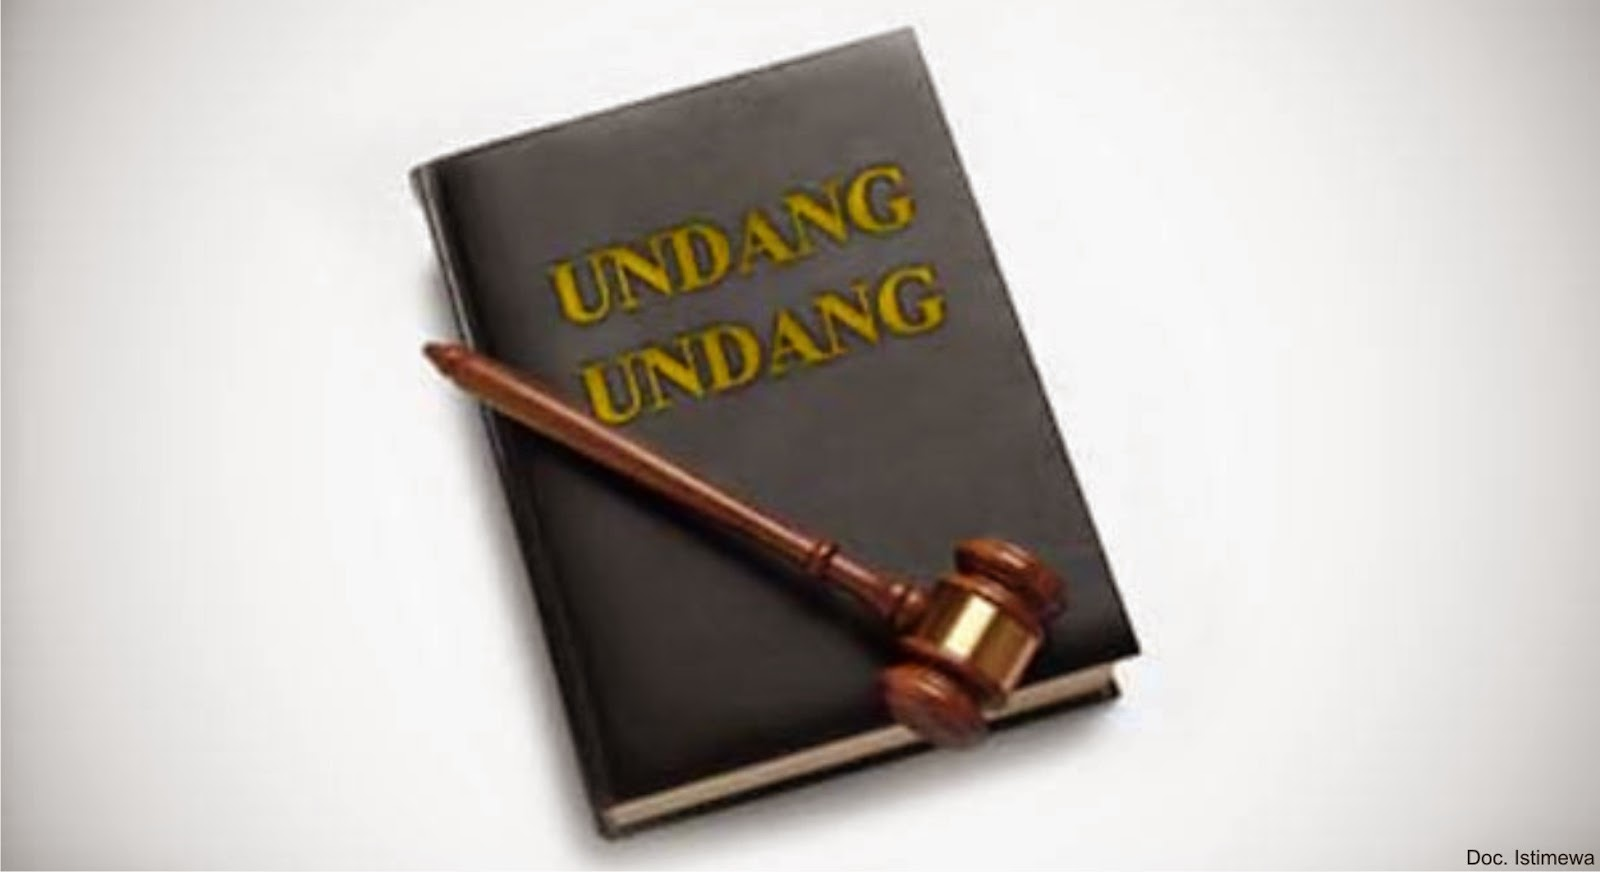 urgensi Peerumusan Hukum, maksud pembuatan hukum, hukum, paradigma hukum